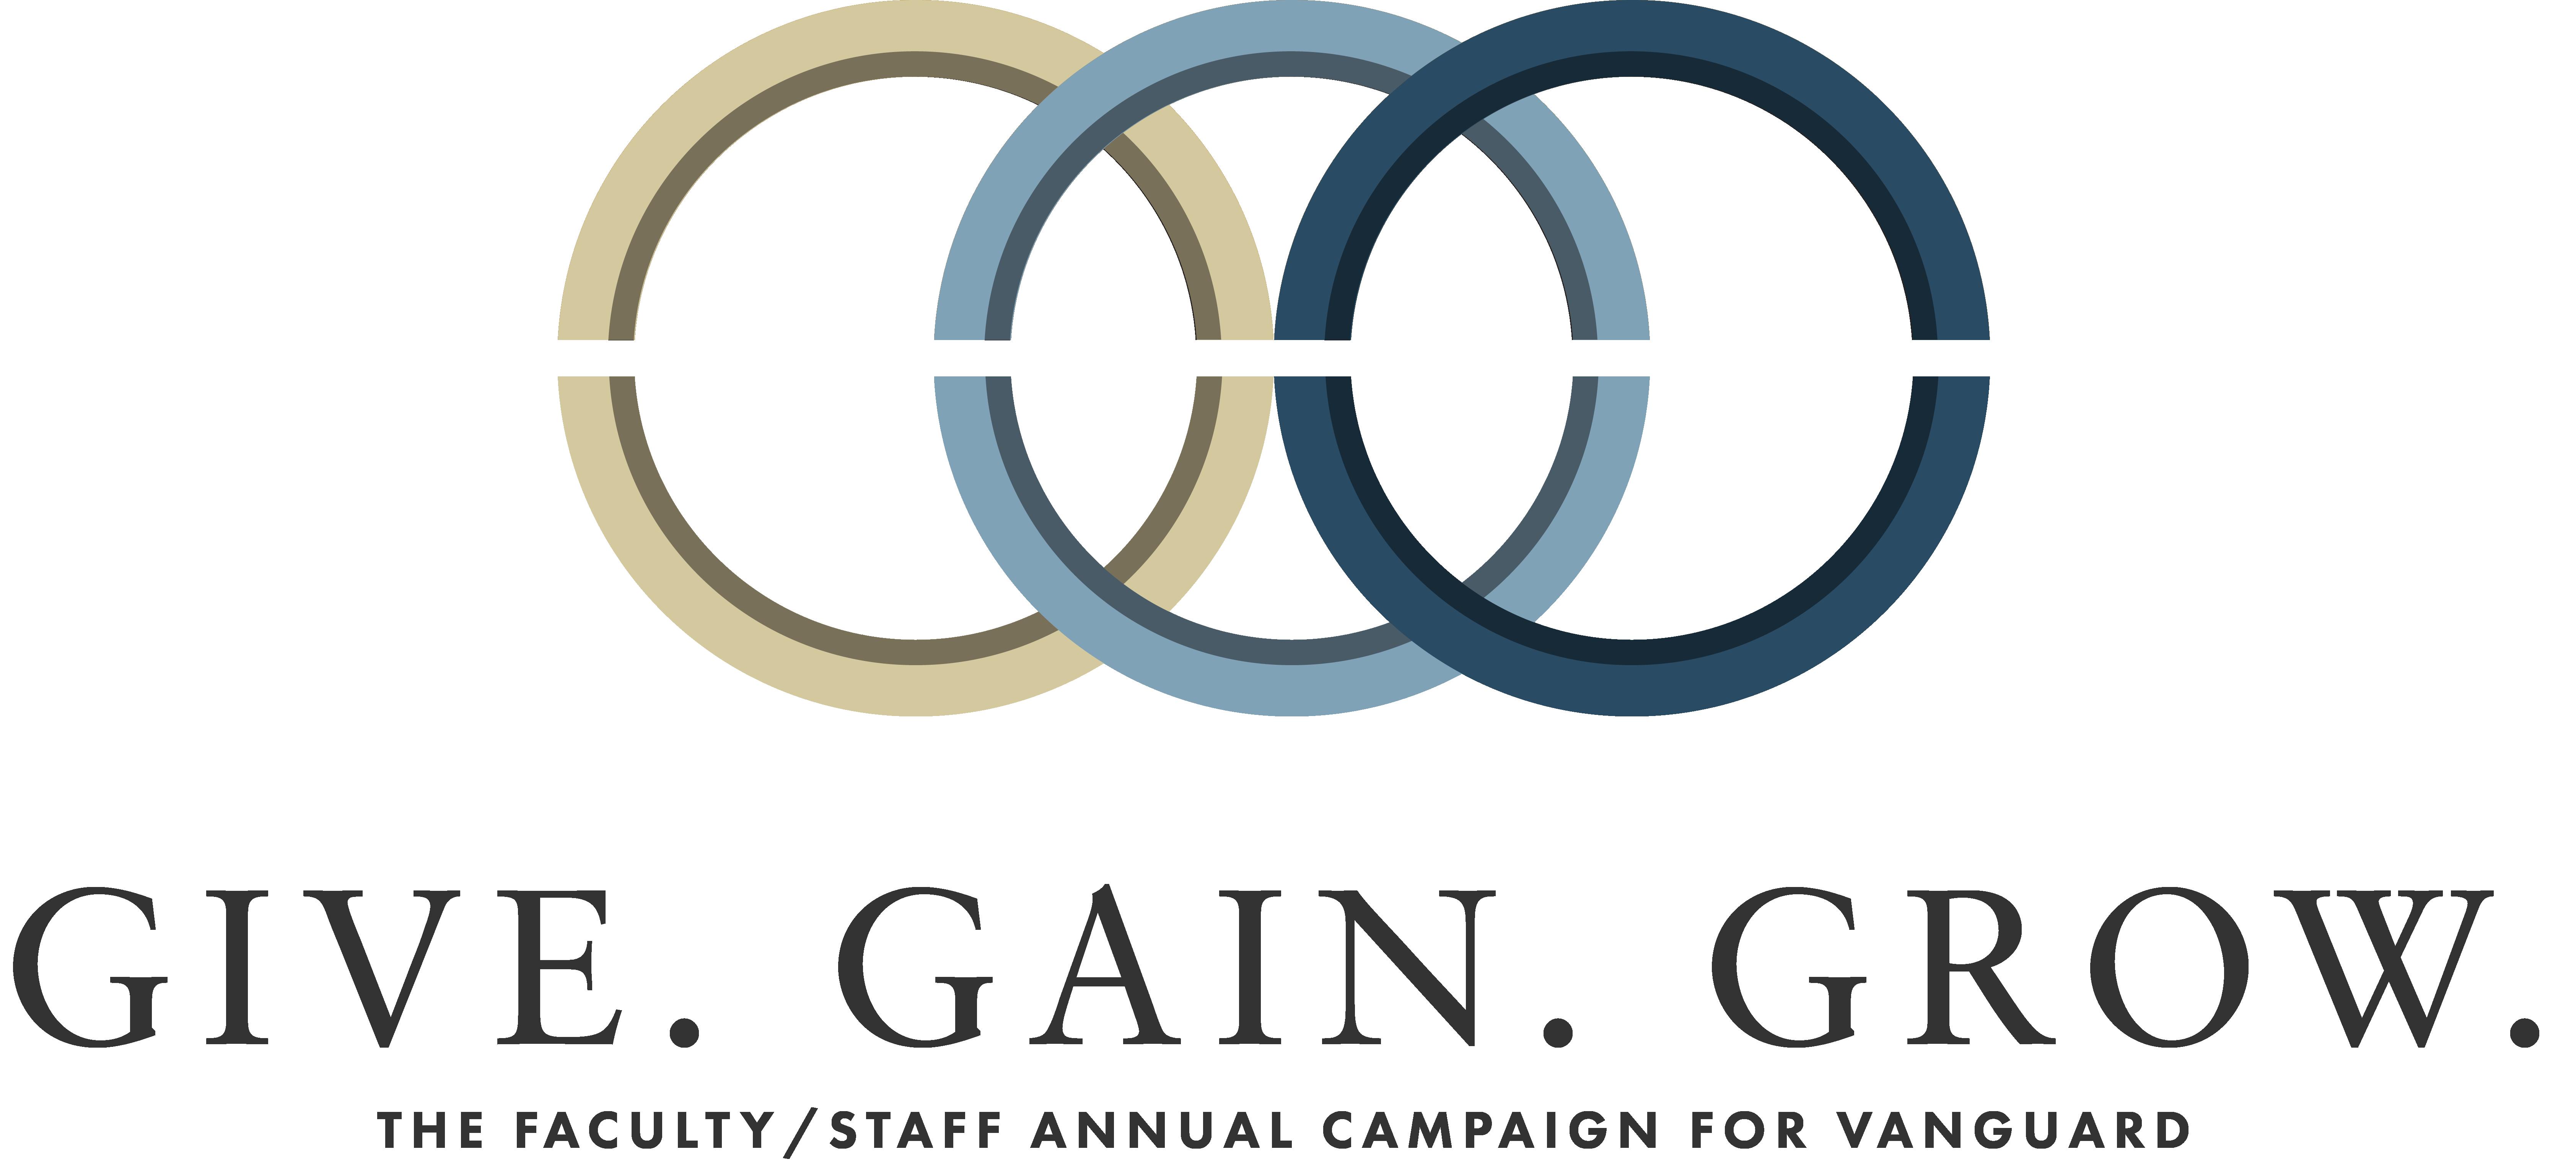 Give Gain Grow Vanguard University